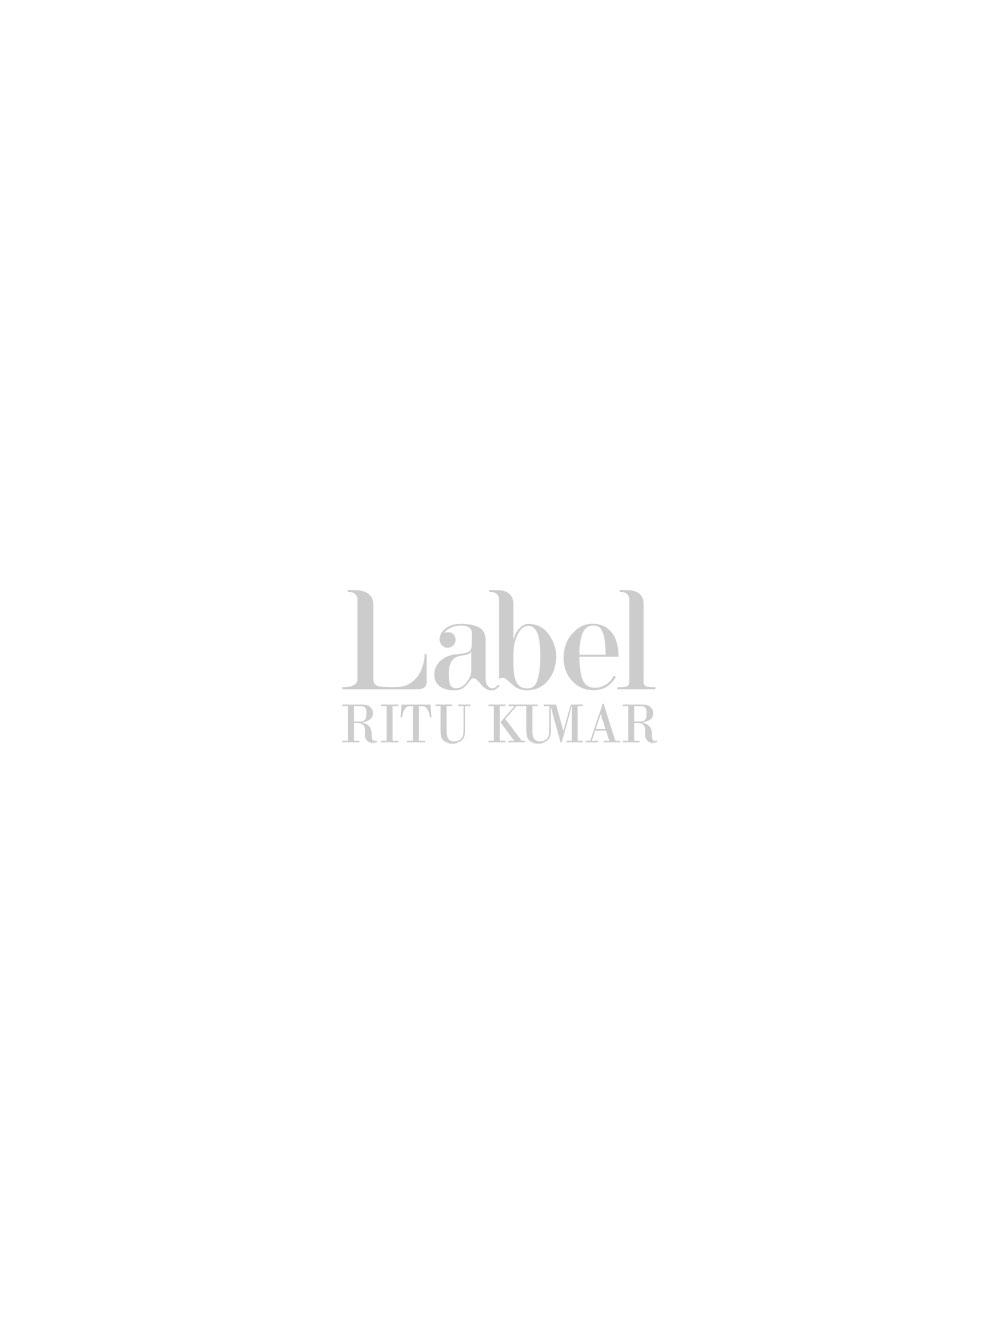 Grey Sleeveless Long dress in Subtle Digital Print